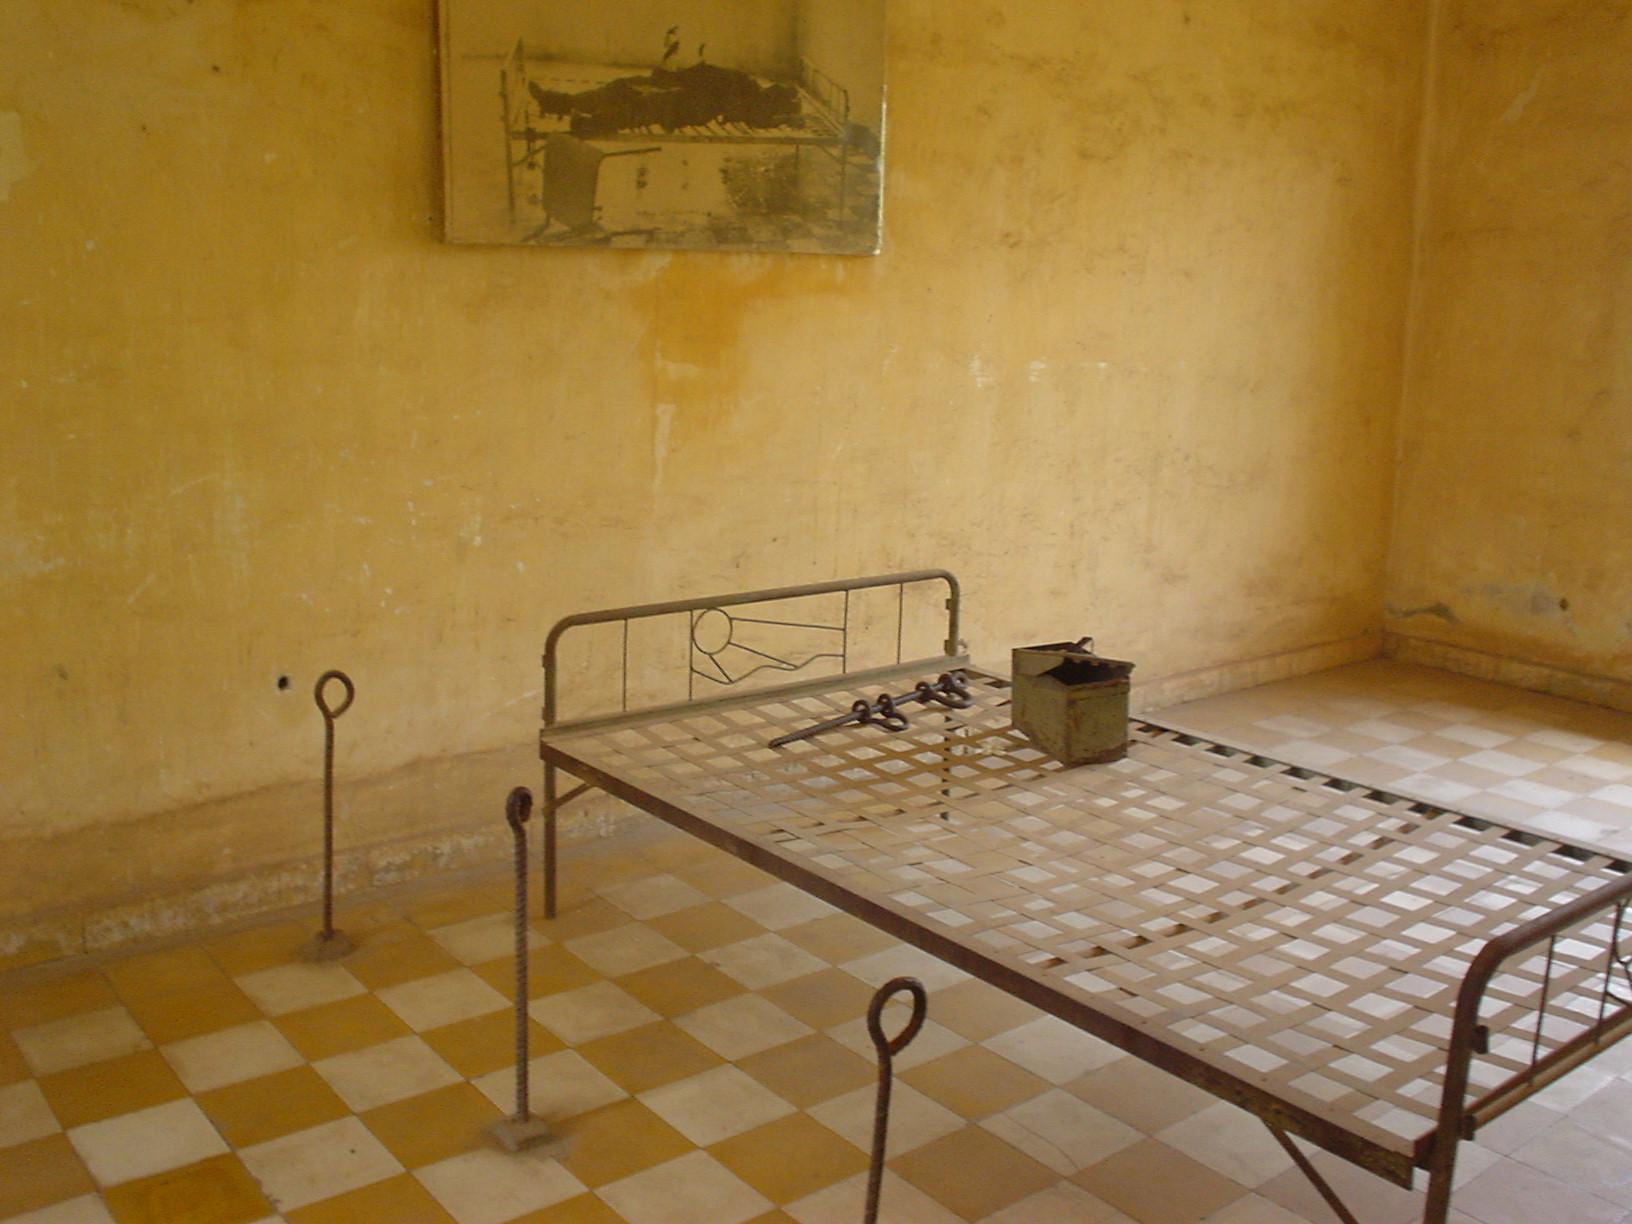 torture-bed-1453109